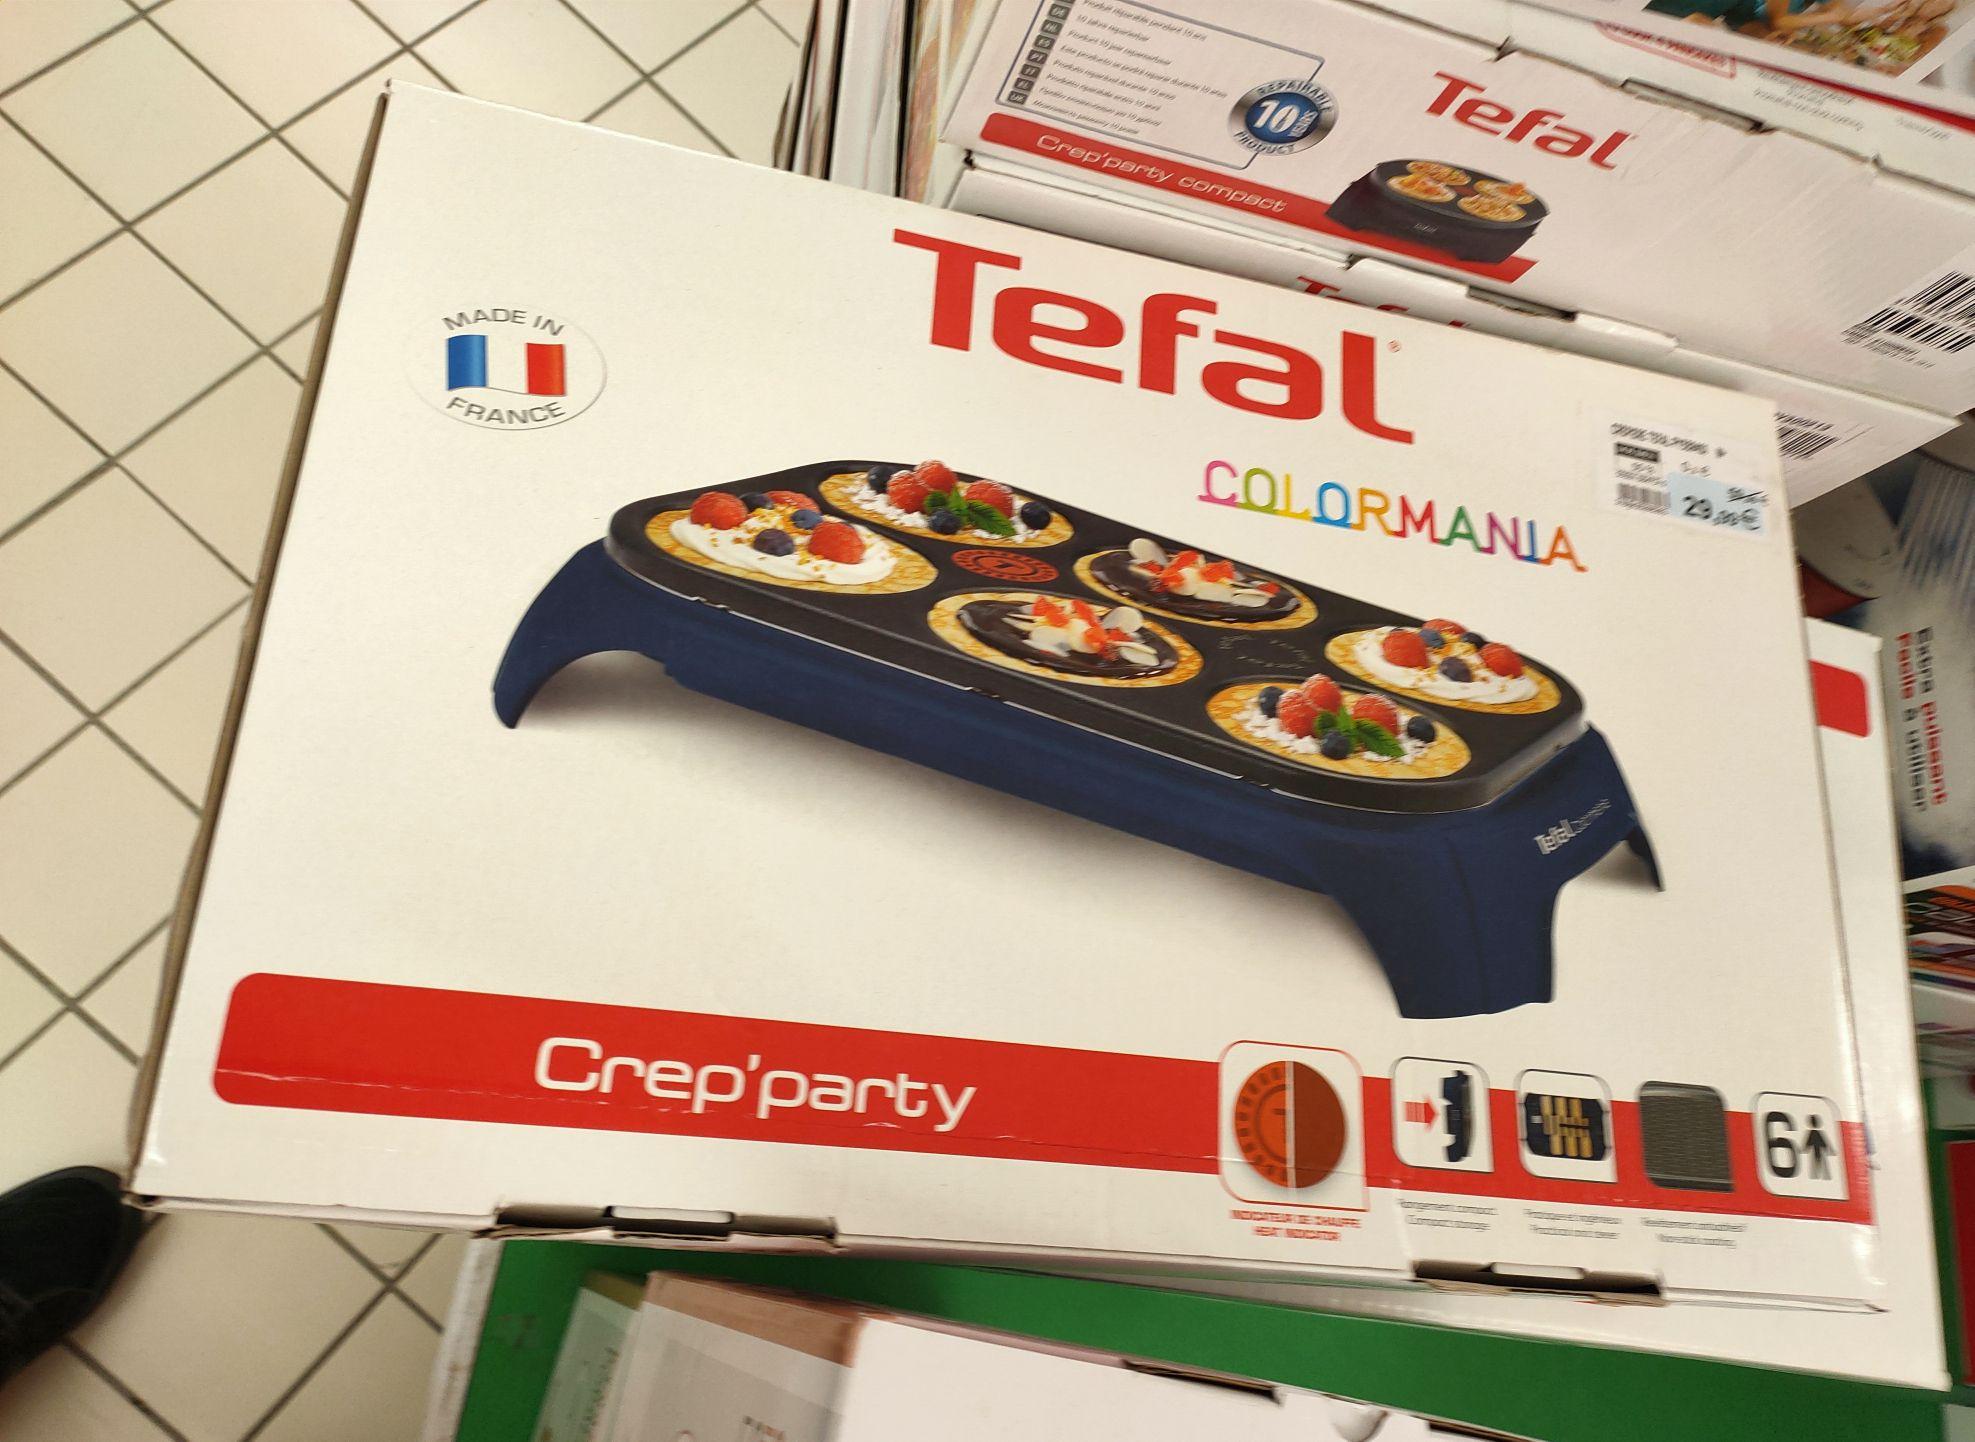 Crêpiere Tefal Crep'party colormania - Super U Corgnac (87)